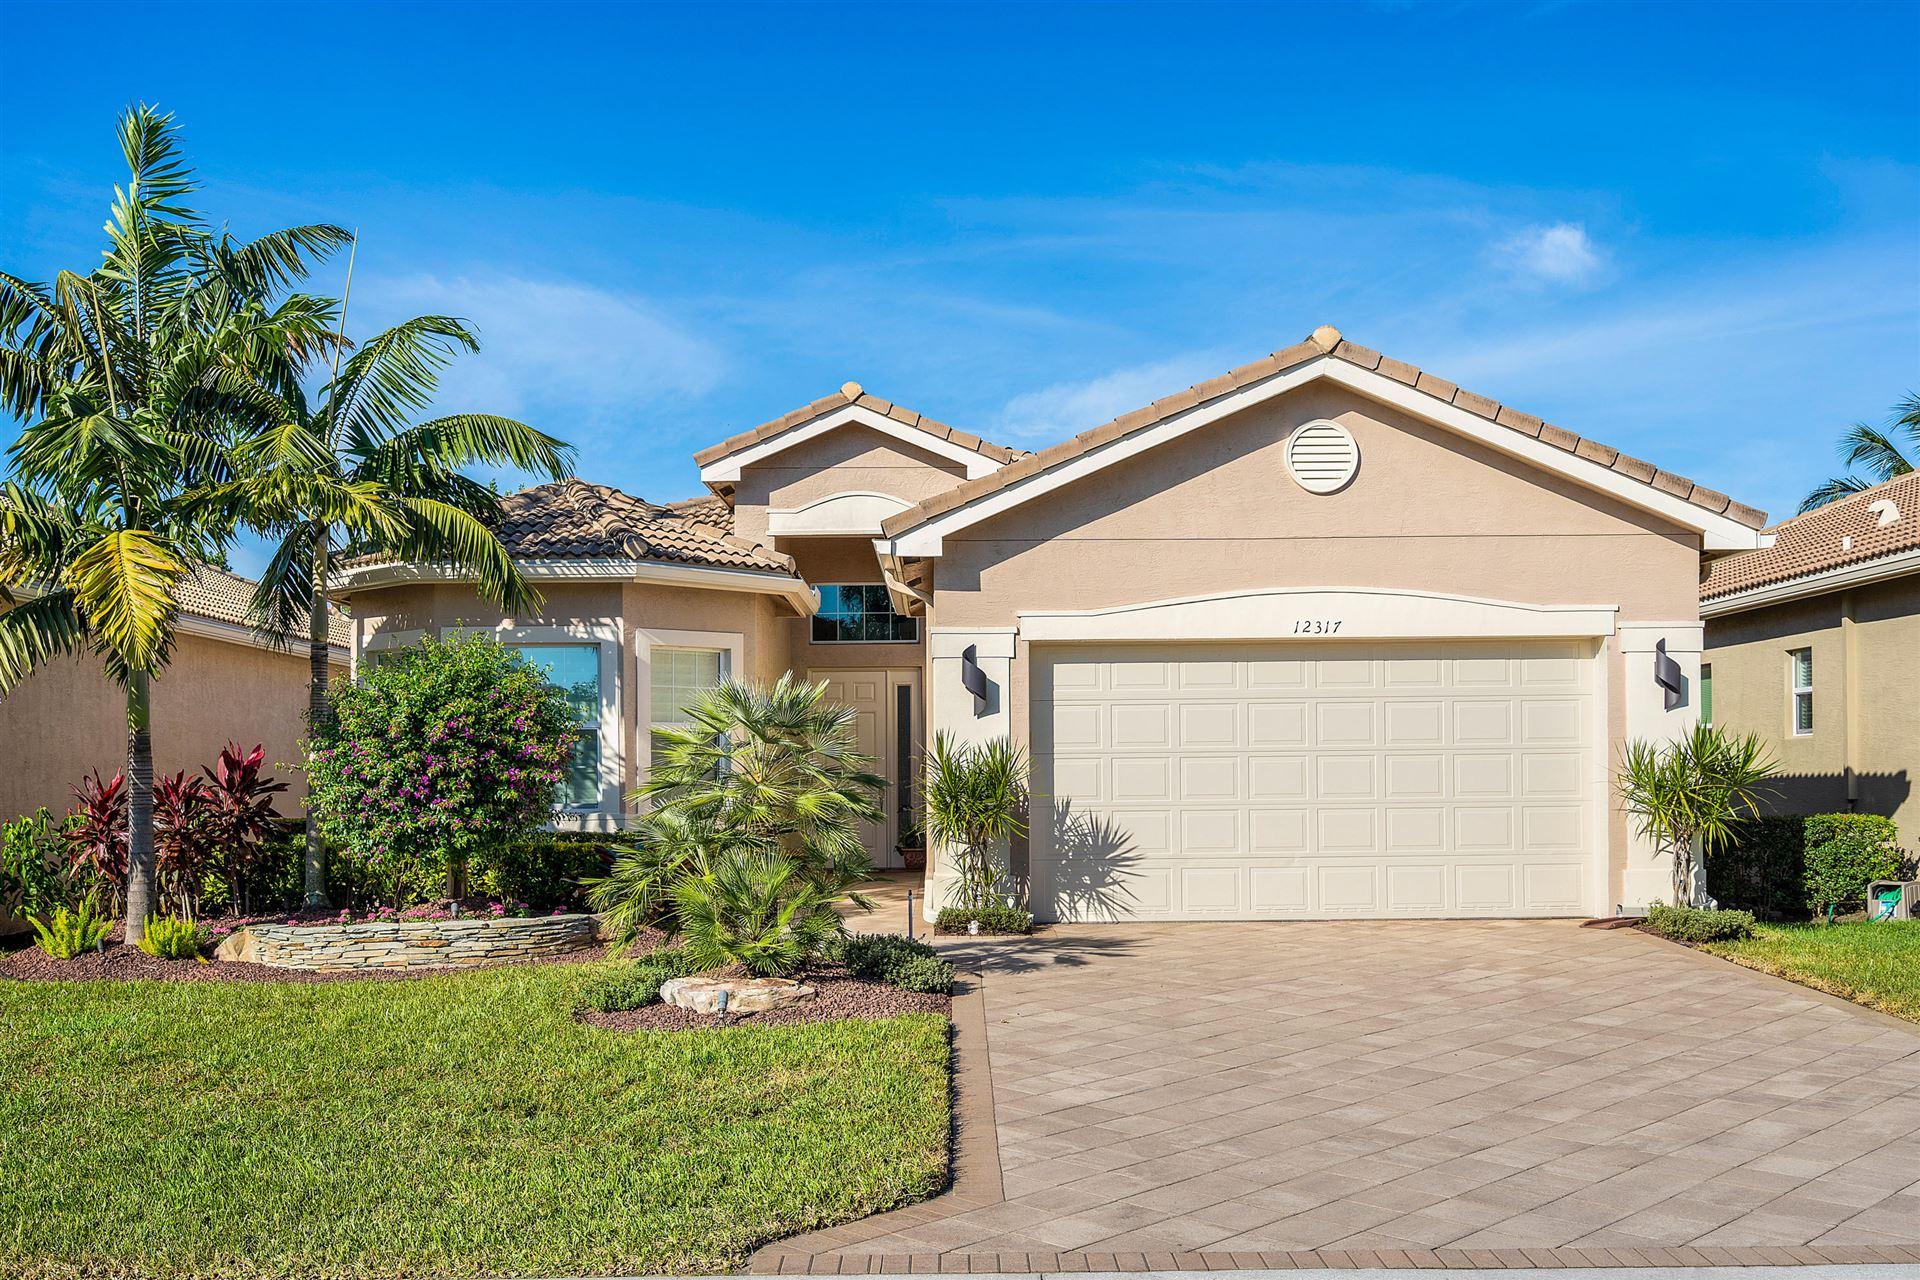 12317 Laguna Valley Terrace, Boynton Beach, FL 33473 - #: RX-10680227